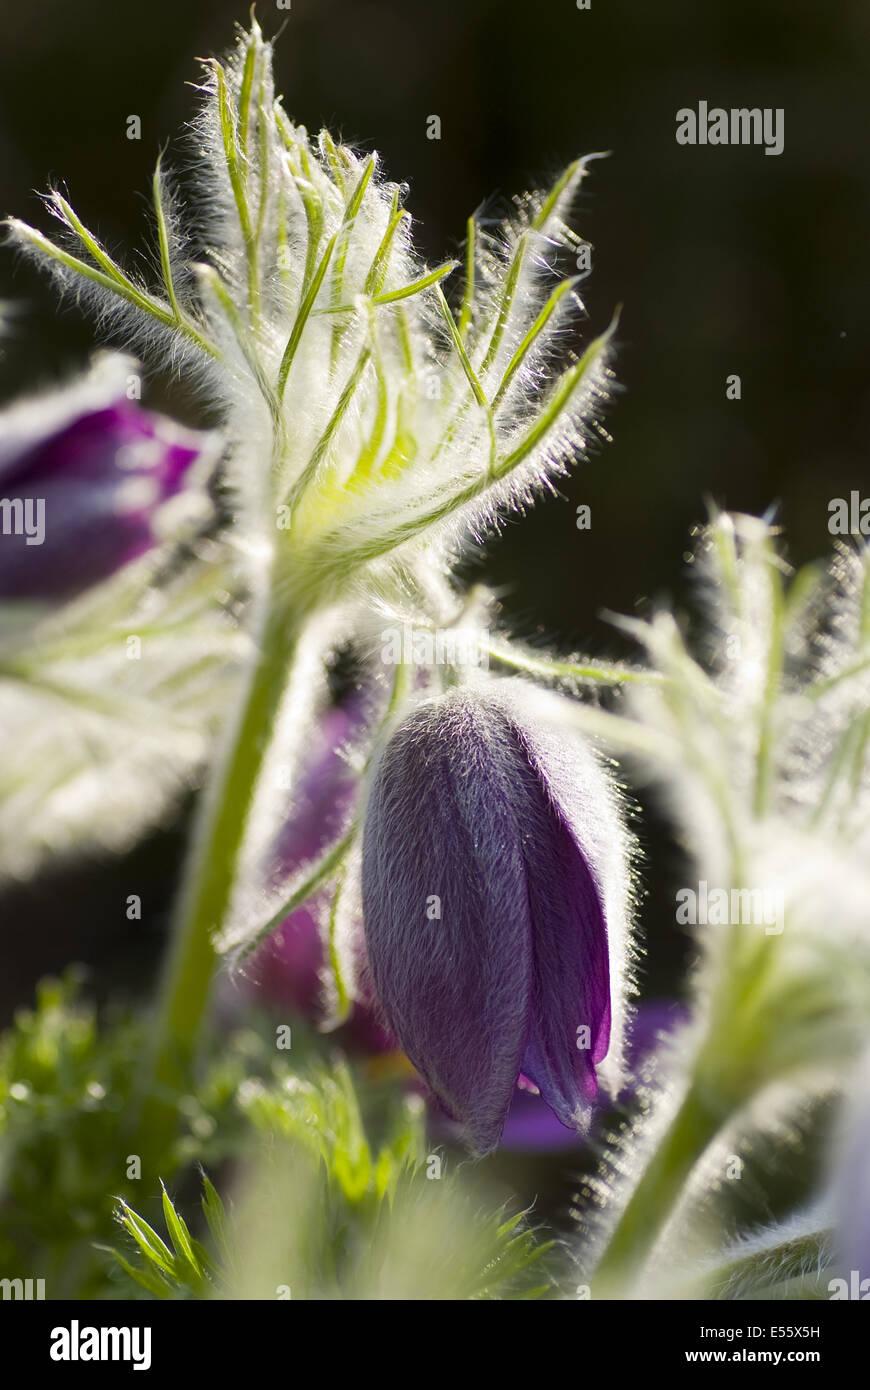 haller's pasqueflower, pulsatilla halleri - Stock Image